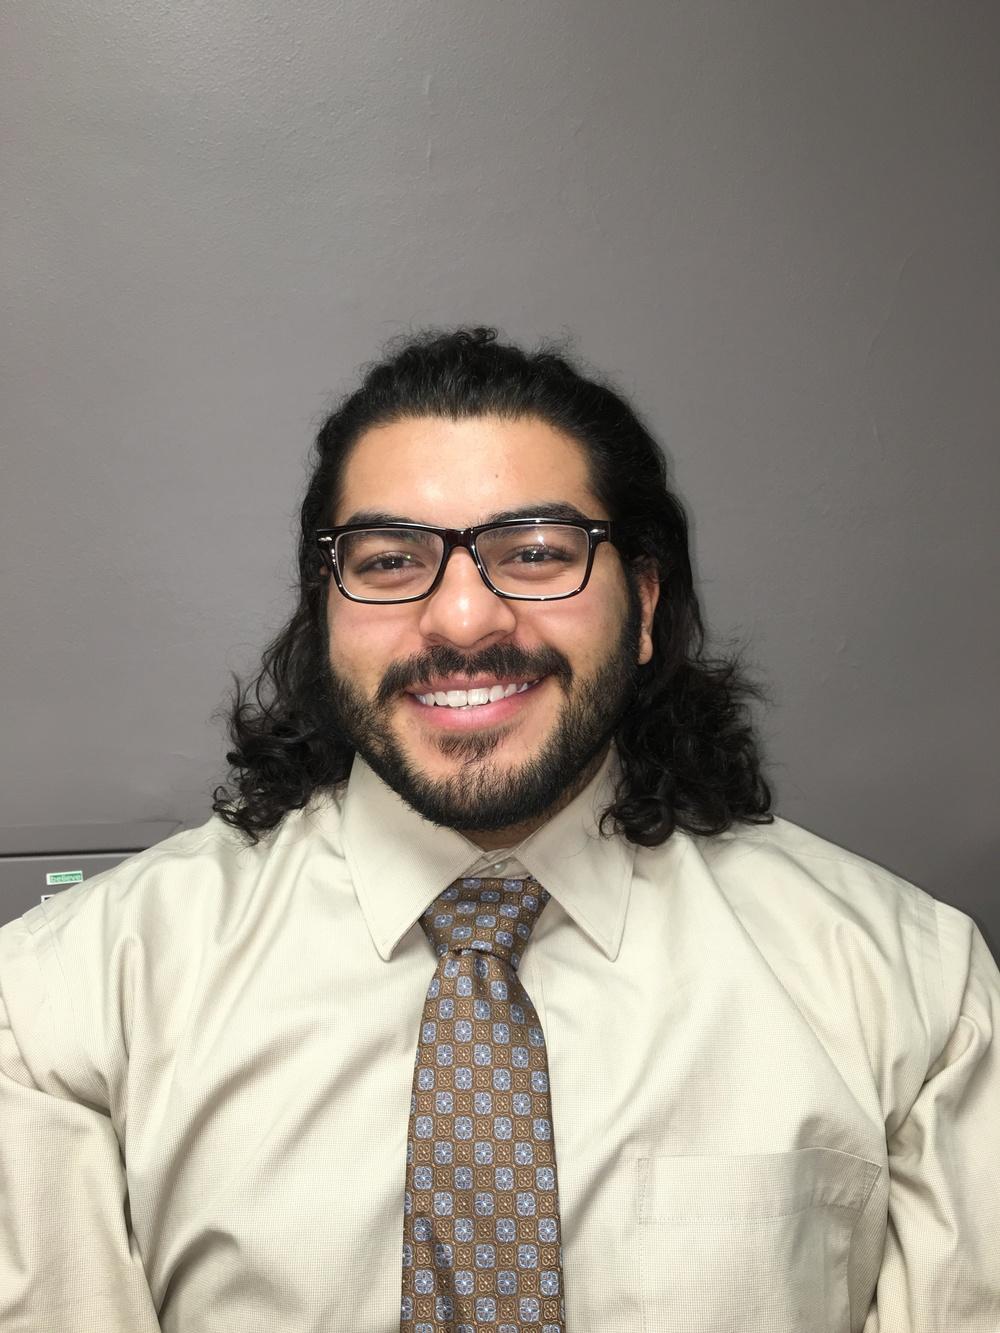 PETER HABIB, Outreach Coordinator